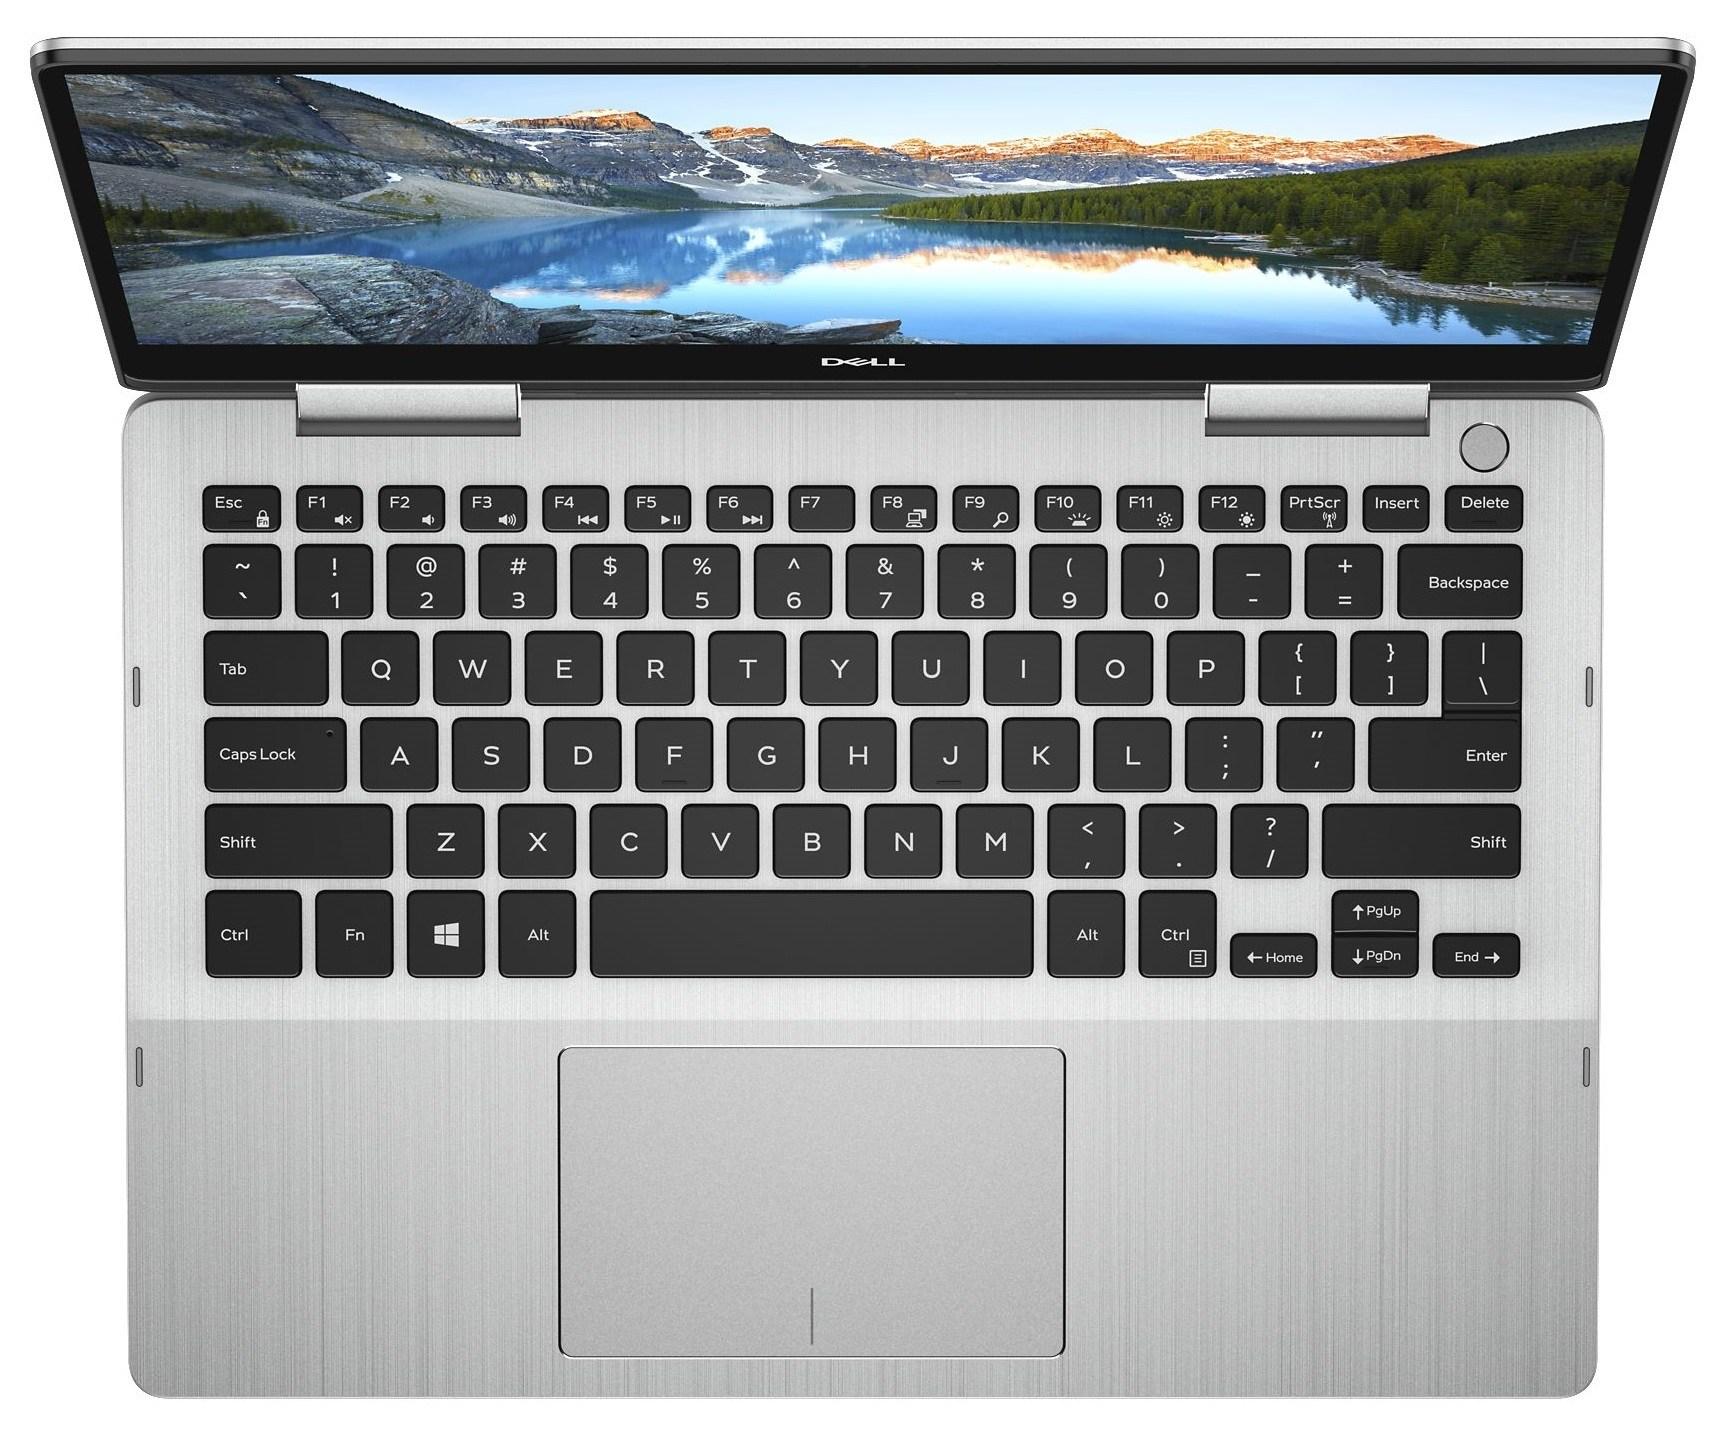 Notebook Dell Inspiron 7386 13.3 Full HD Touch Intel Core i5-8265U RAM 8GB SSD 256GB Windows 10 Home